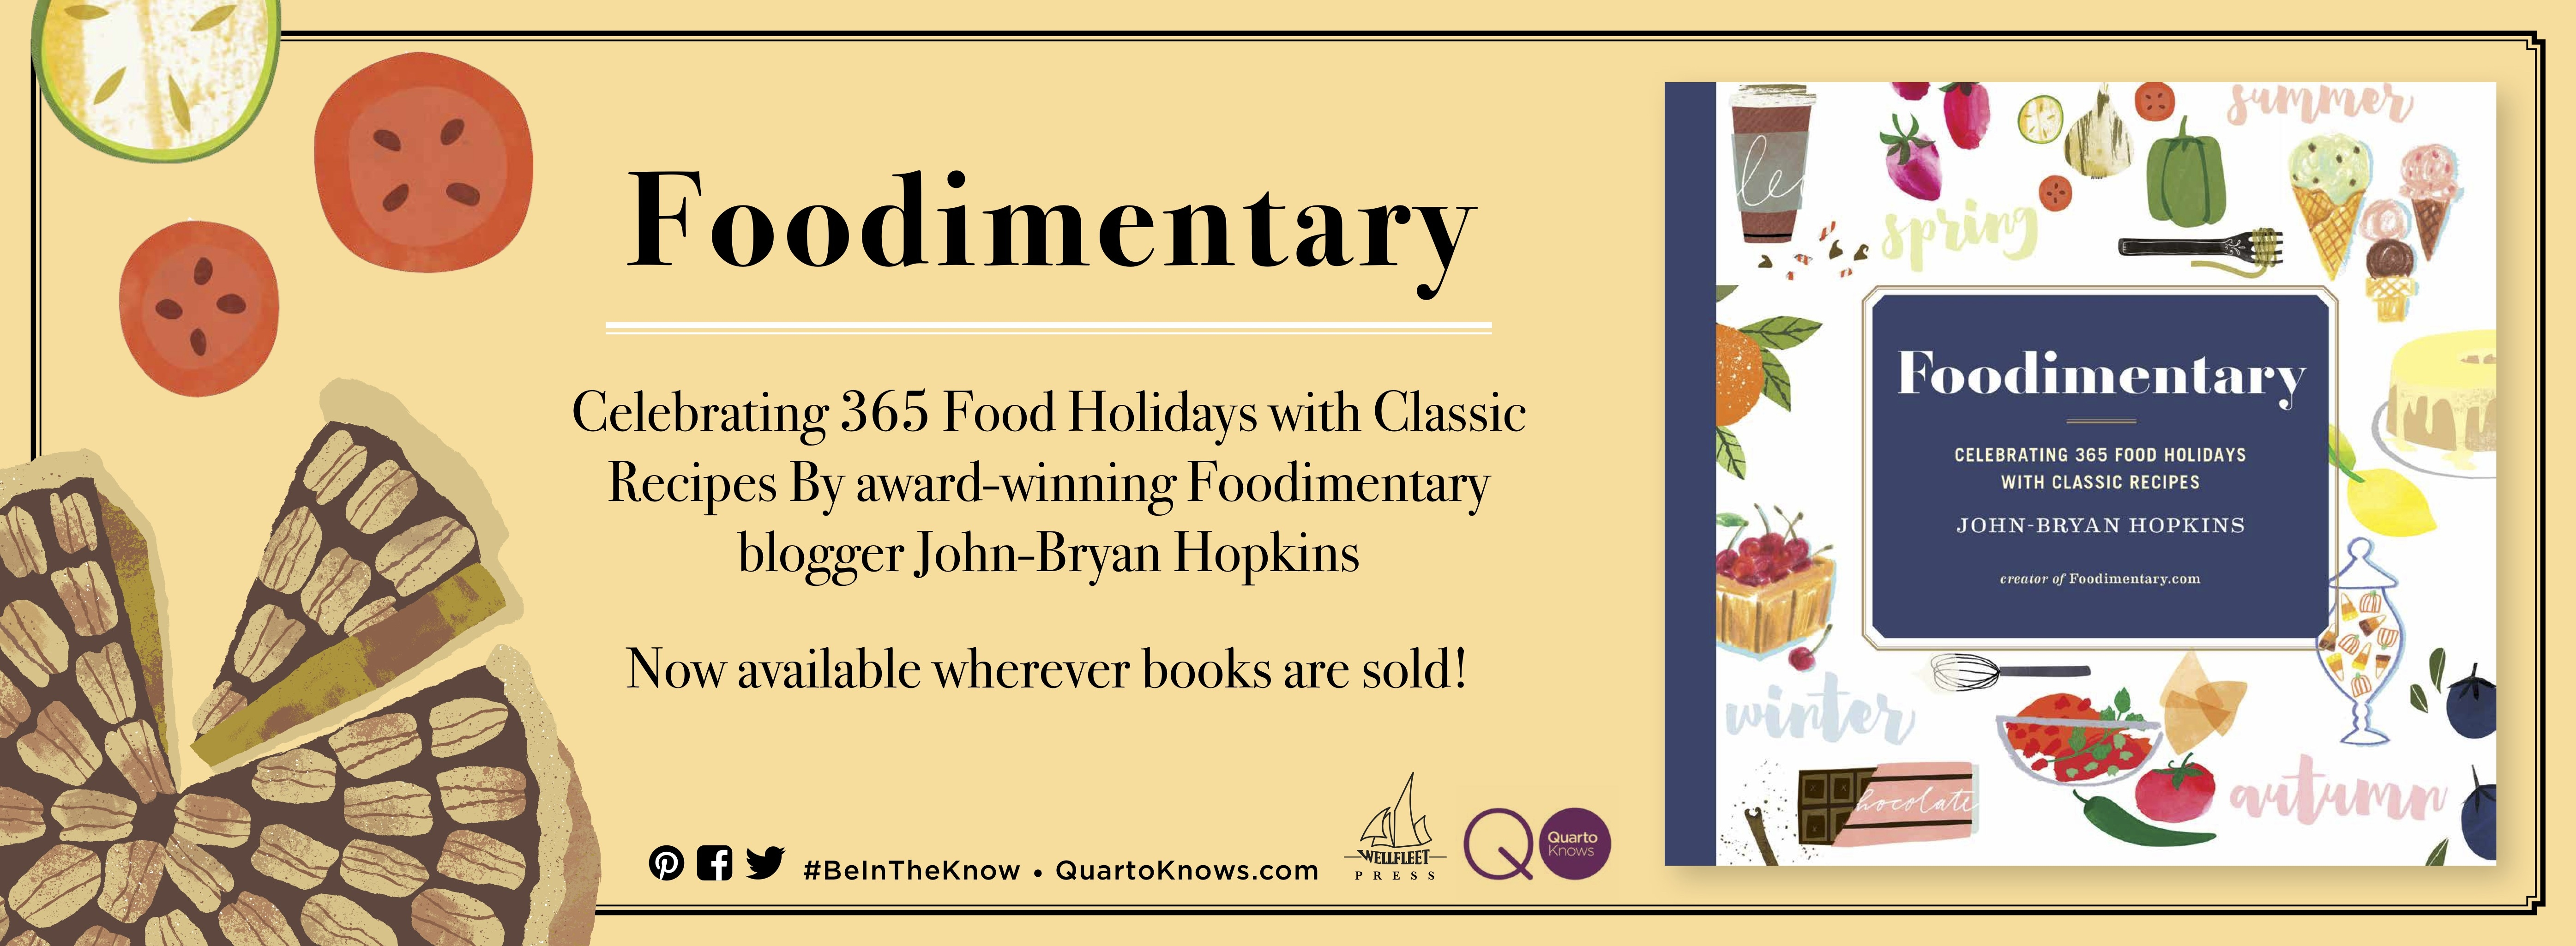 January Holidays   Foodimentary - National Food Holidays-National Food Holidays 2020